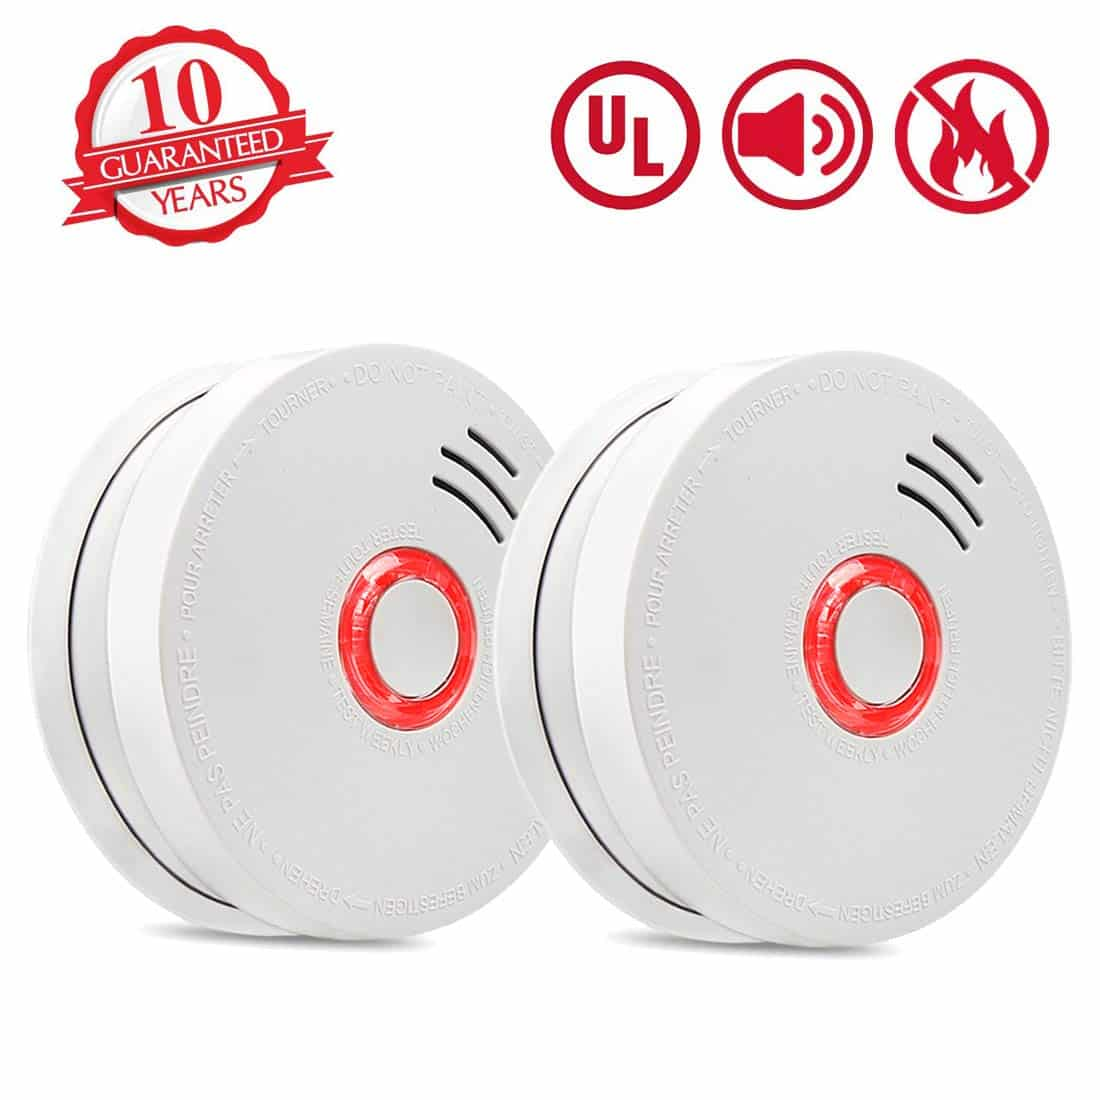 DASINKO Smoke Detector Alarm